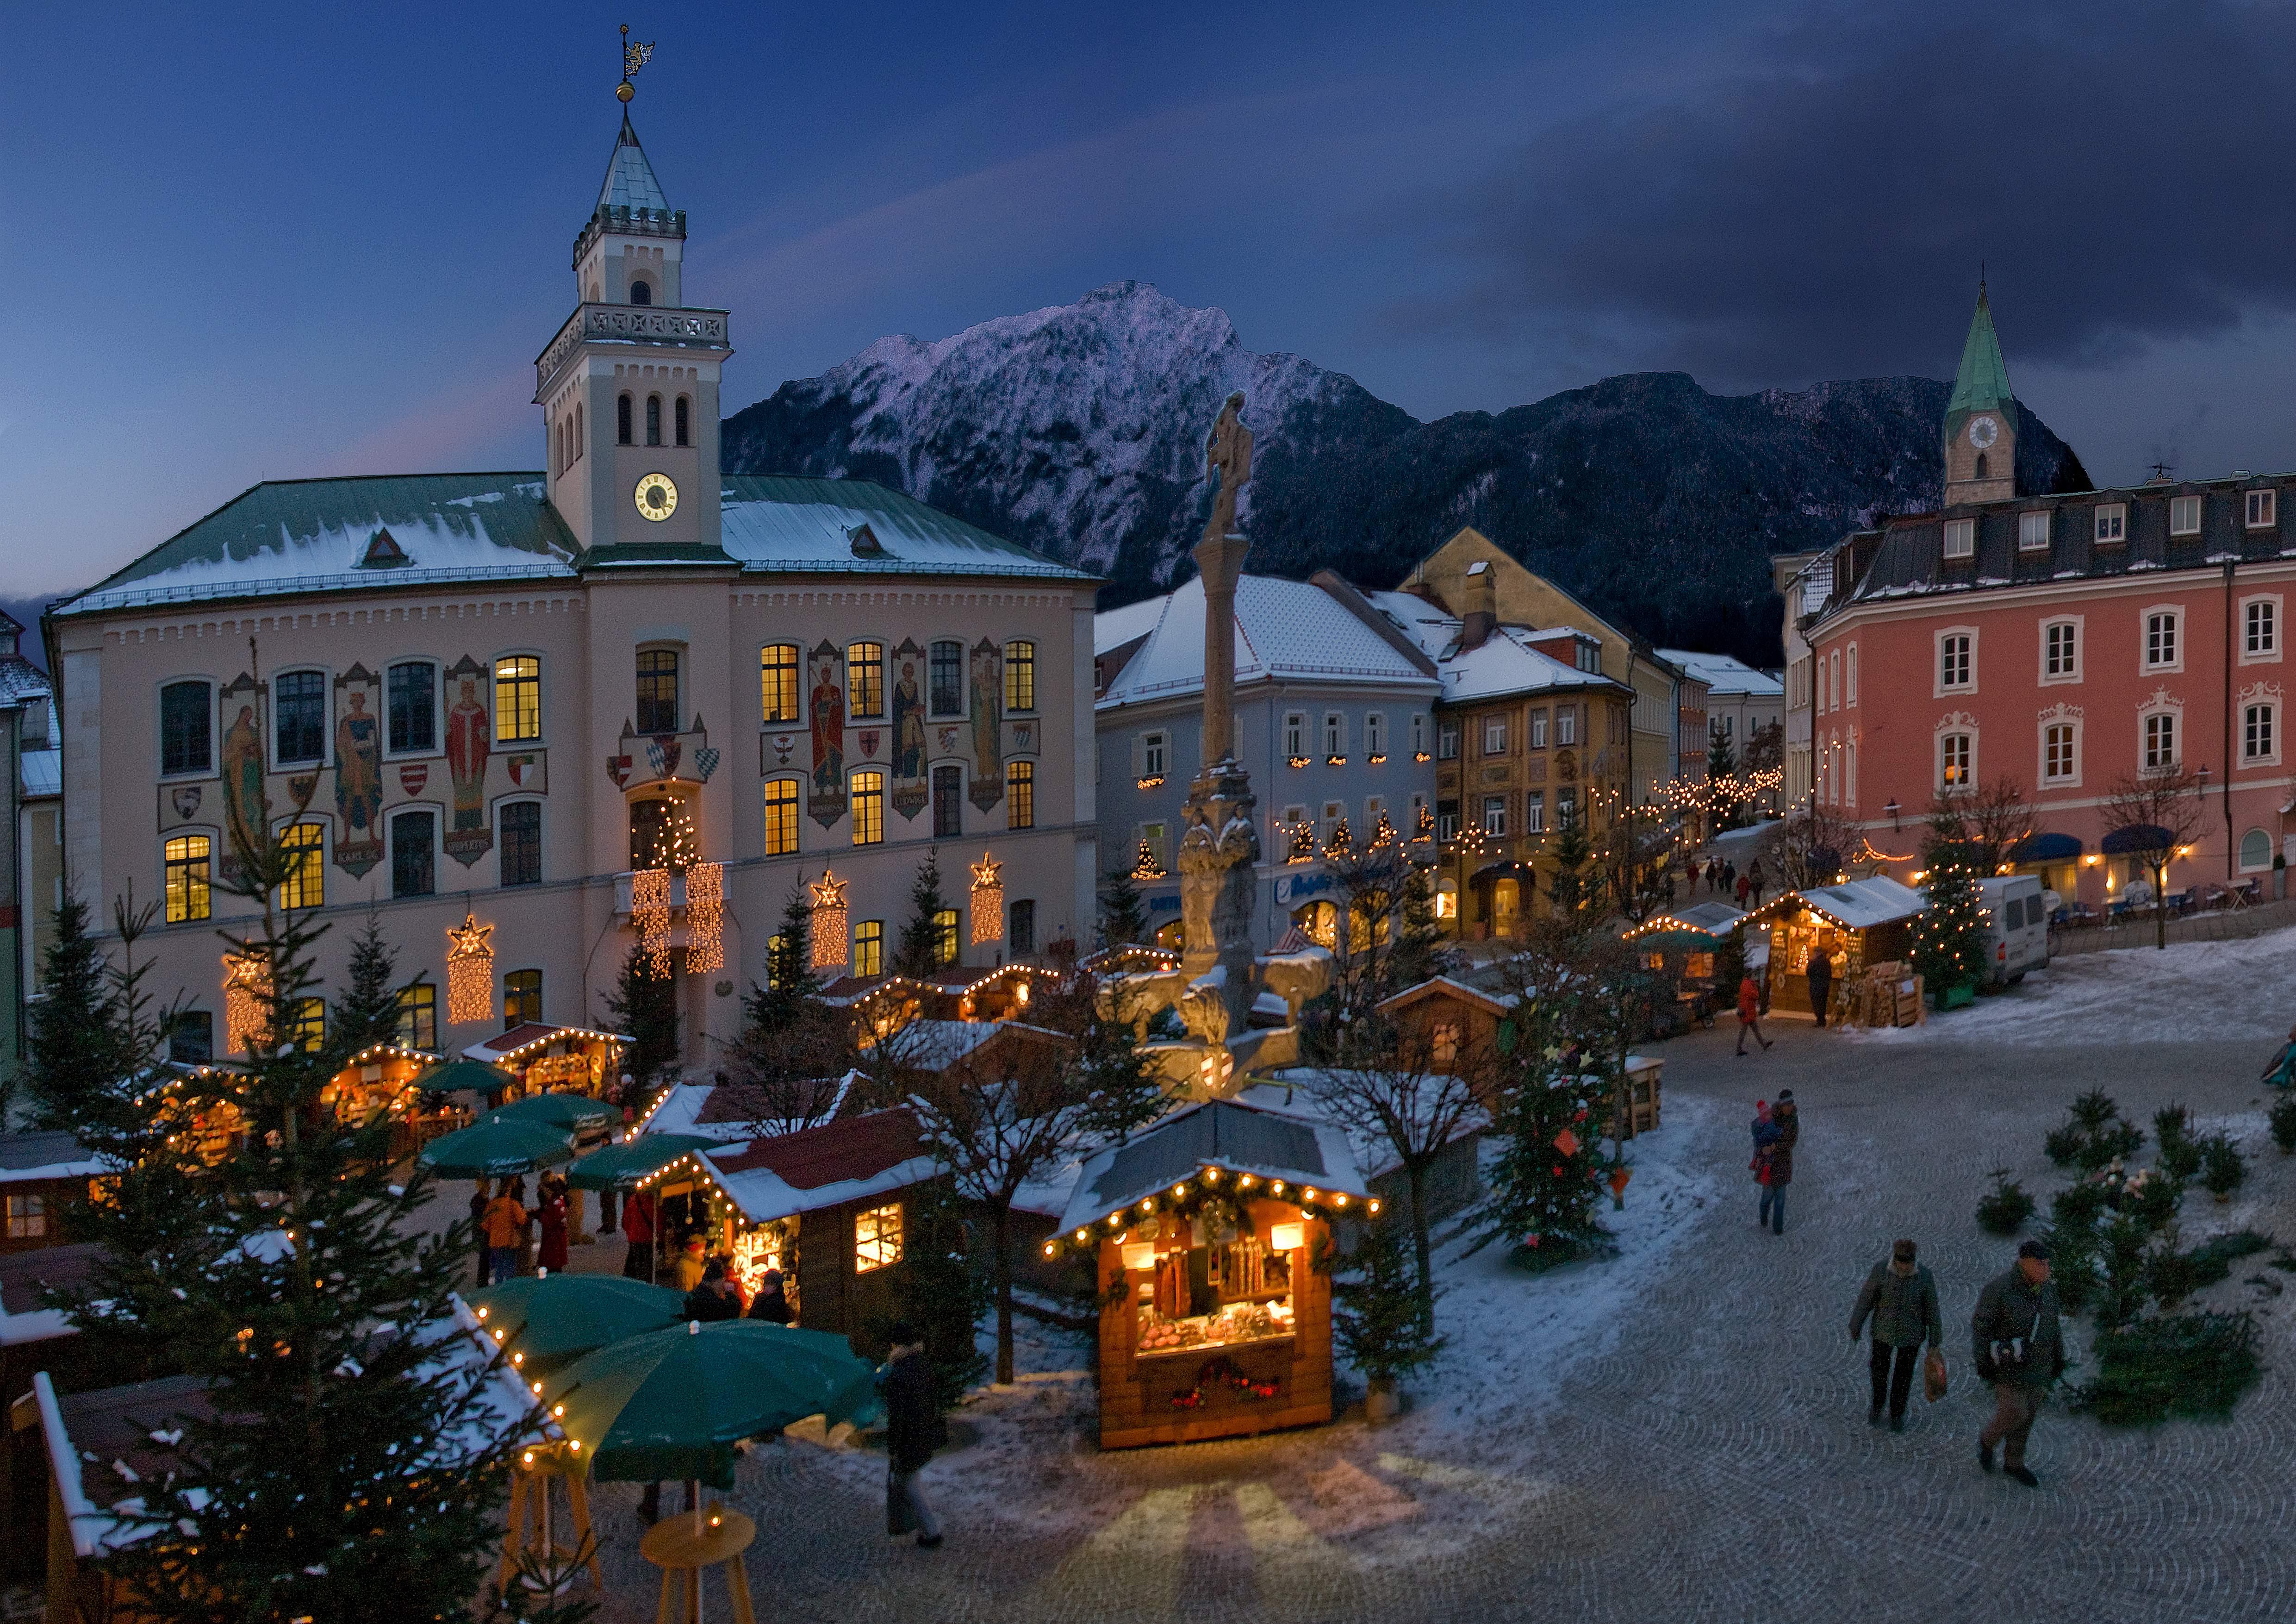 Christmas atmosphere in the Alpine Pearls